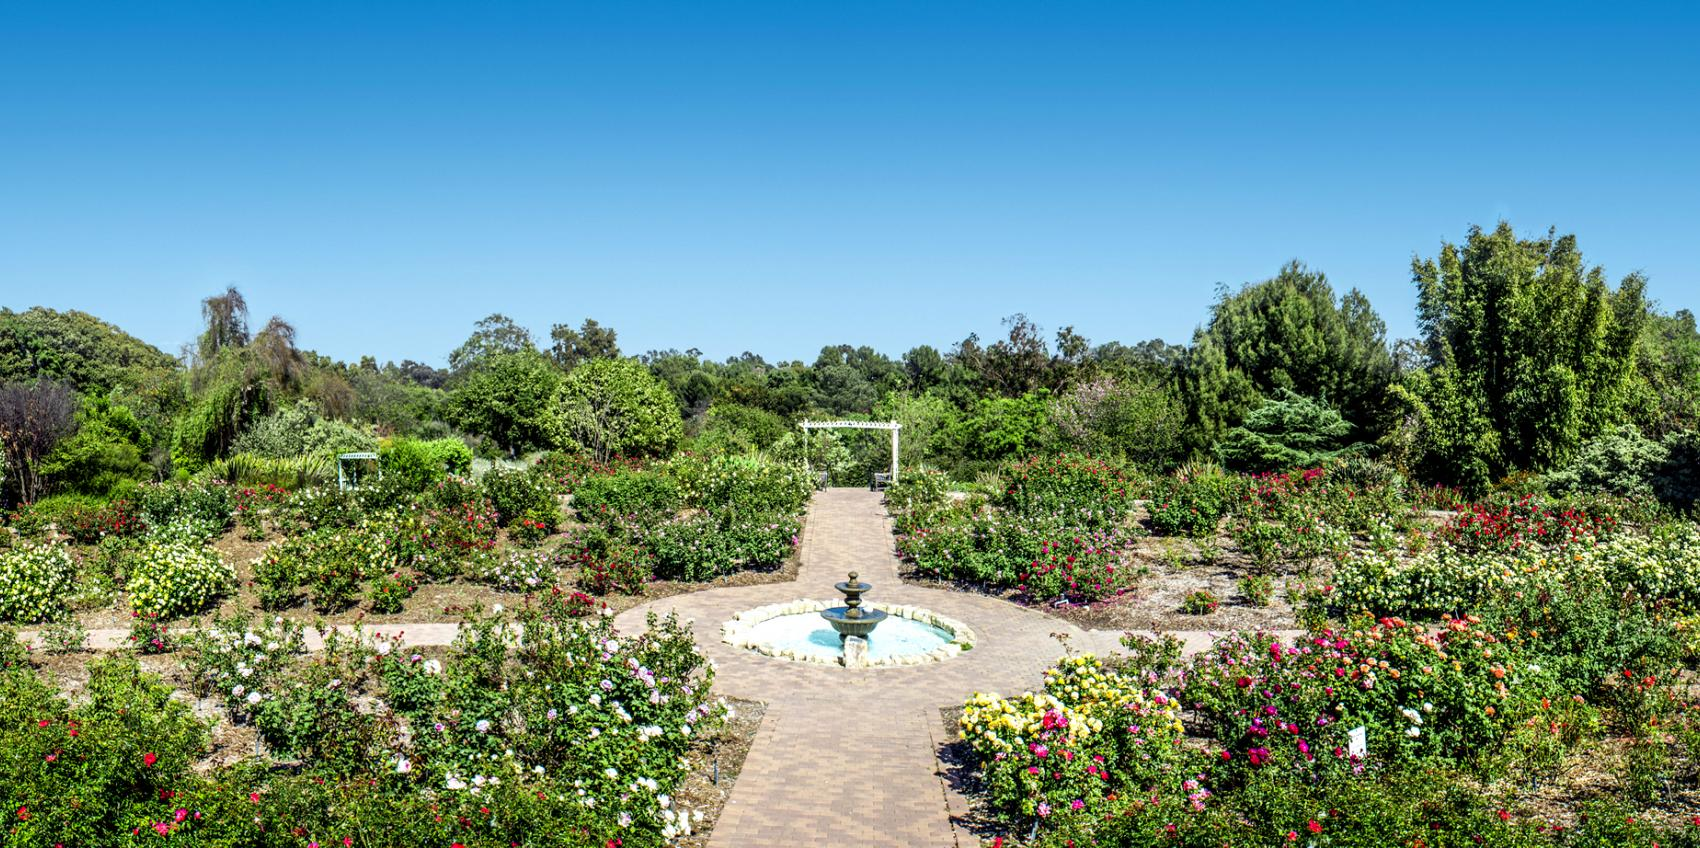 South Coast Botanic Garden Foundation American Public Gardens Association